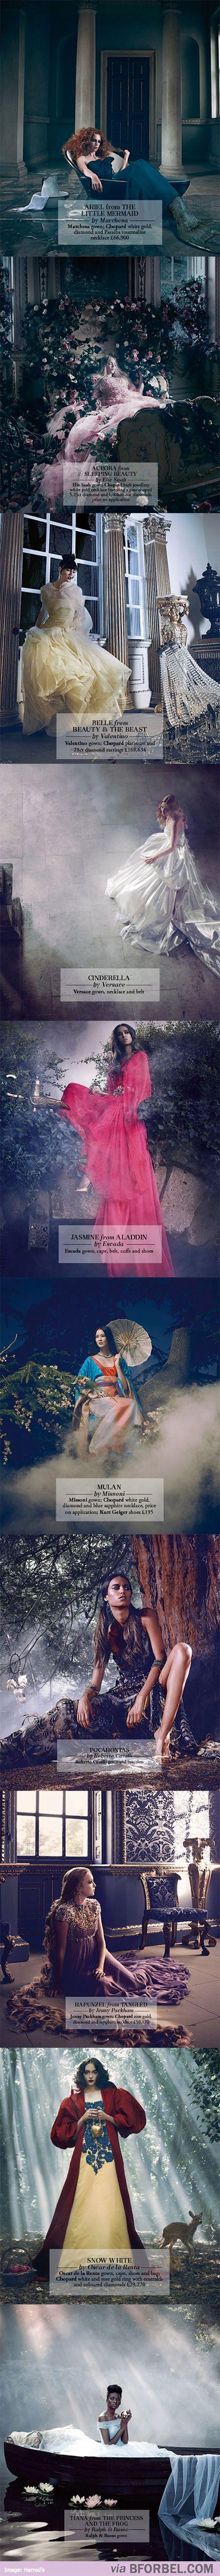 Disney Princess Designer Displays by Harrod's